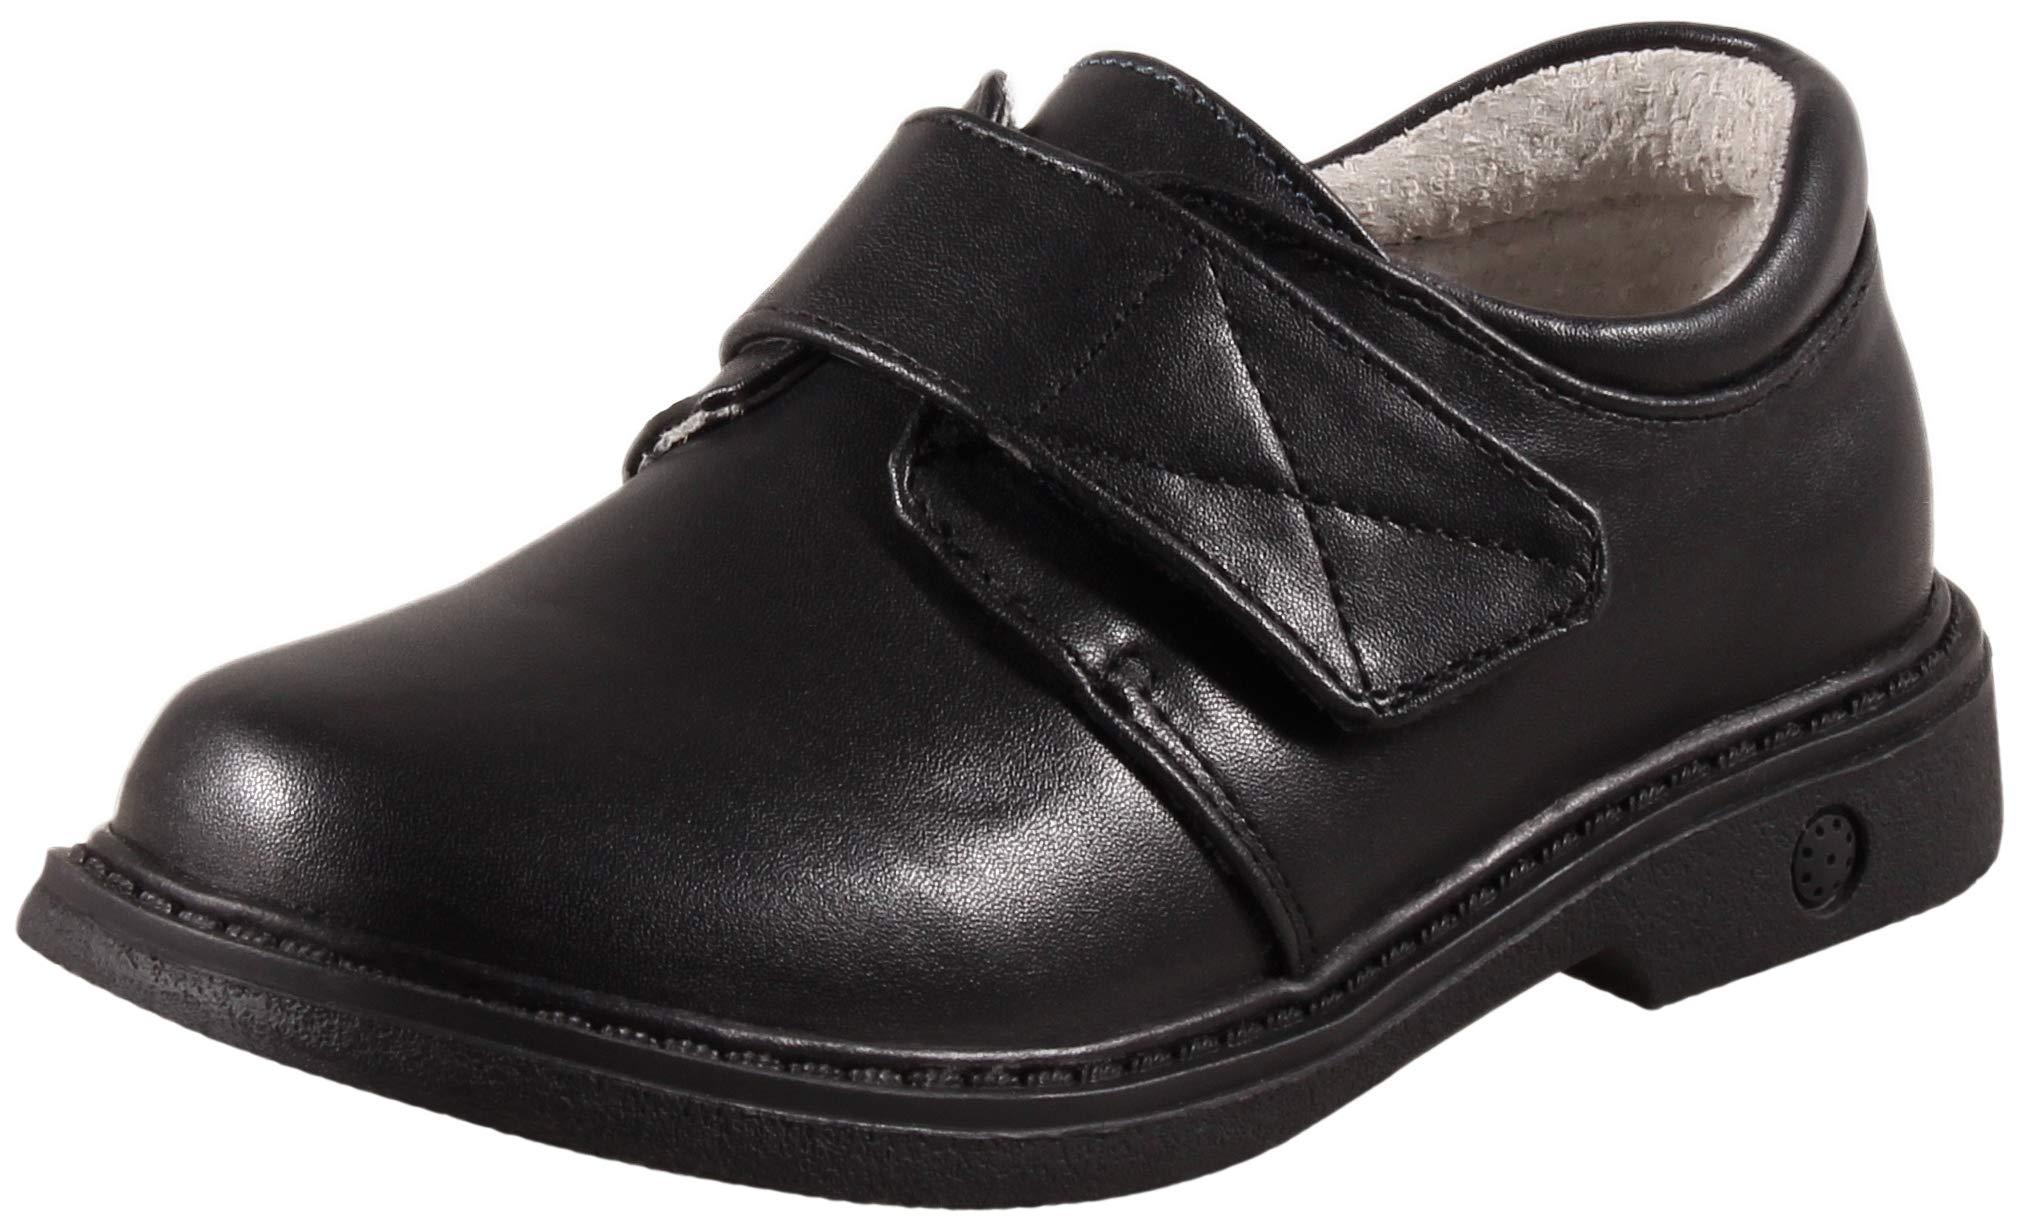 SKOEX Boy's School Uniform Easy Fasten Dress Oxford Shoe Black US Size 9 Black